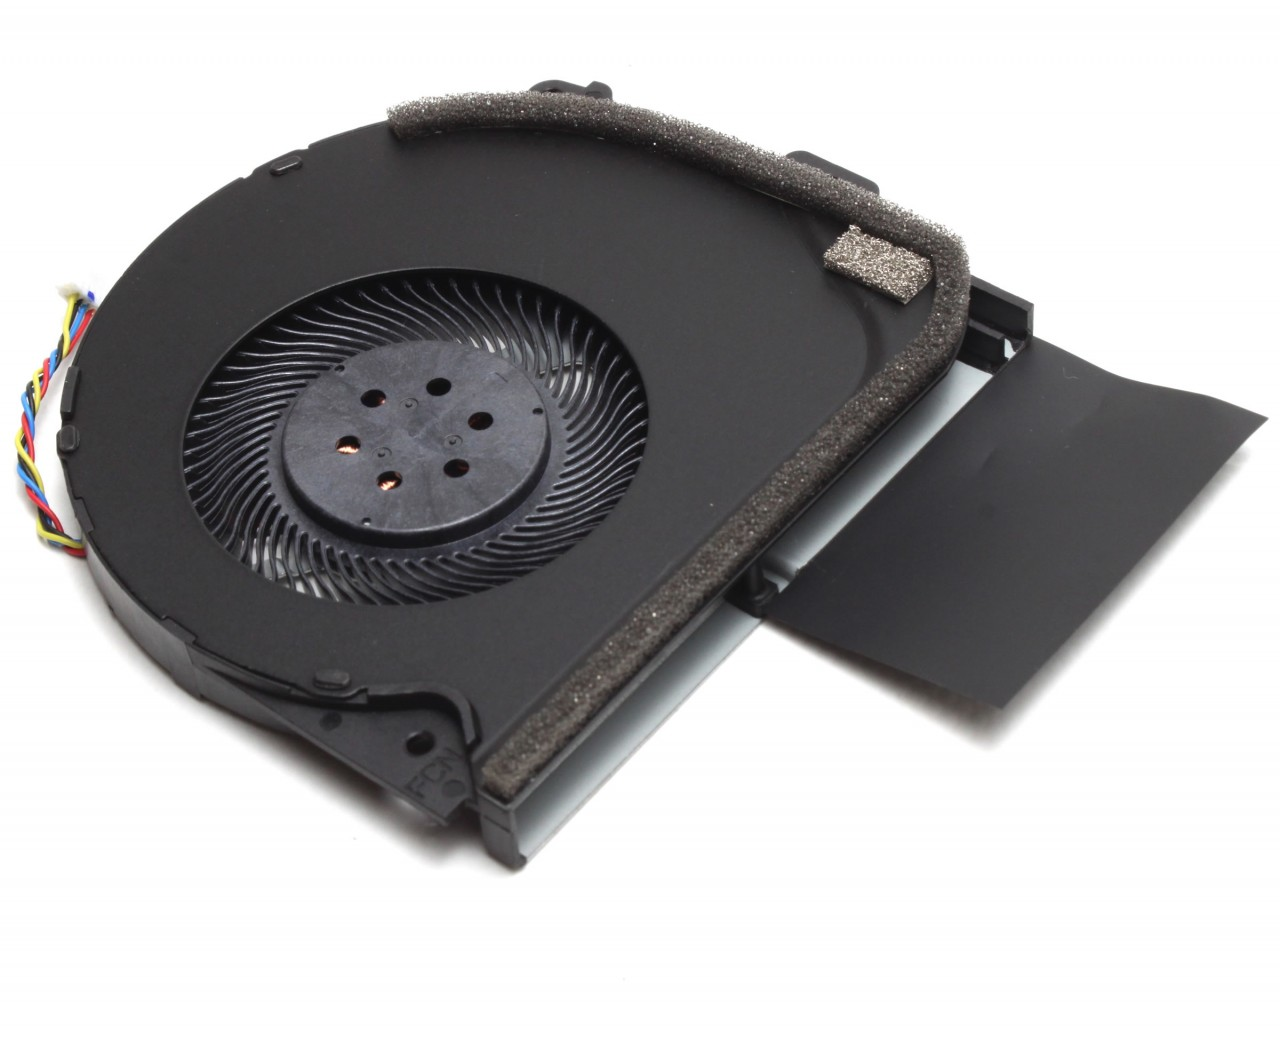 Cooler procesor CPU laptop Asus FK0A imagine powerlaptop.ro 2021